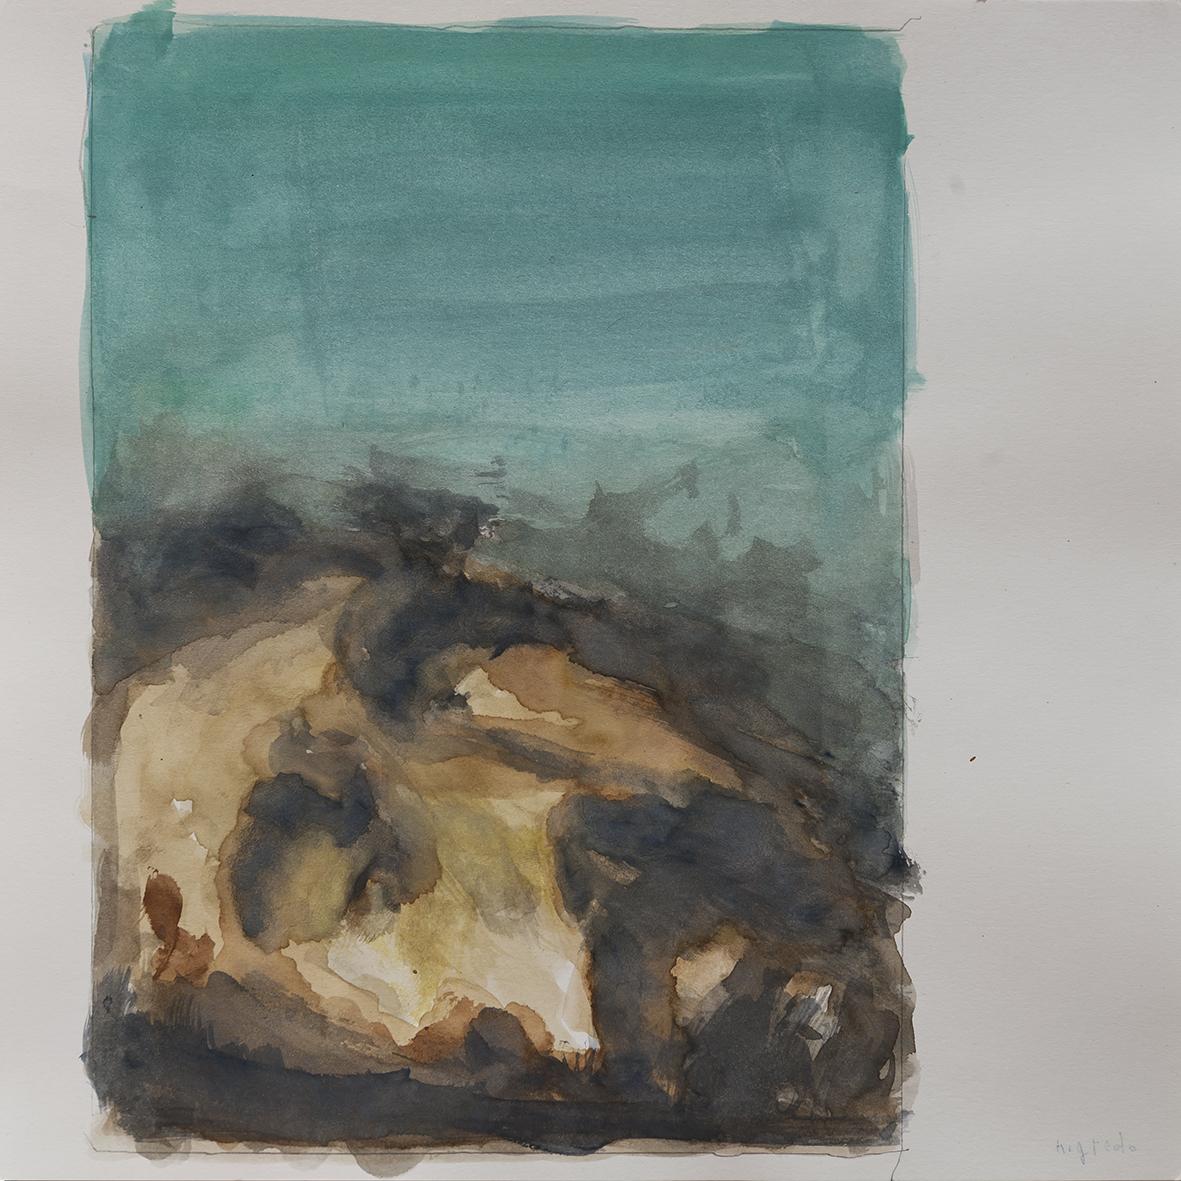 nigredo, 2014 | watercolours on paper, 25x25 cm